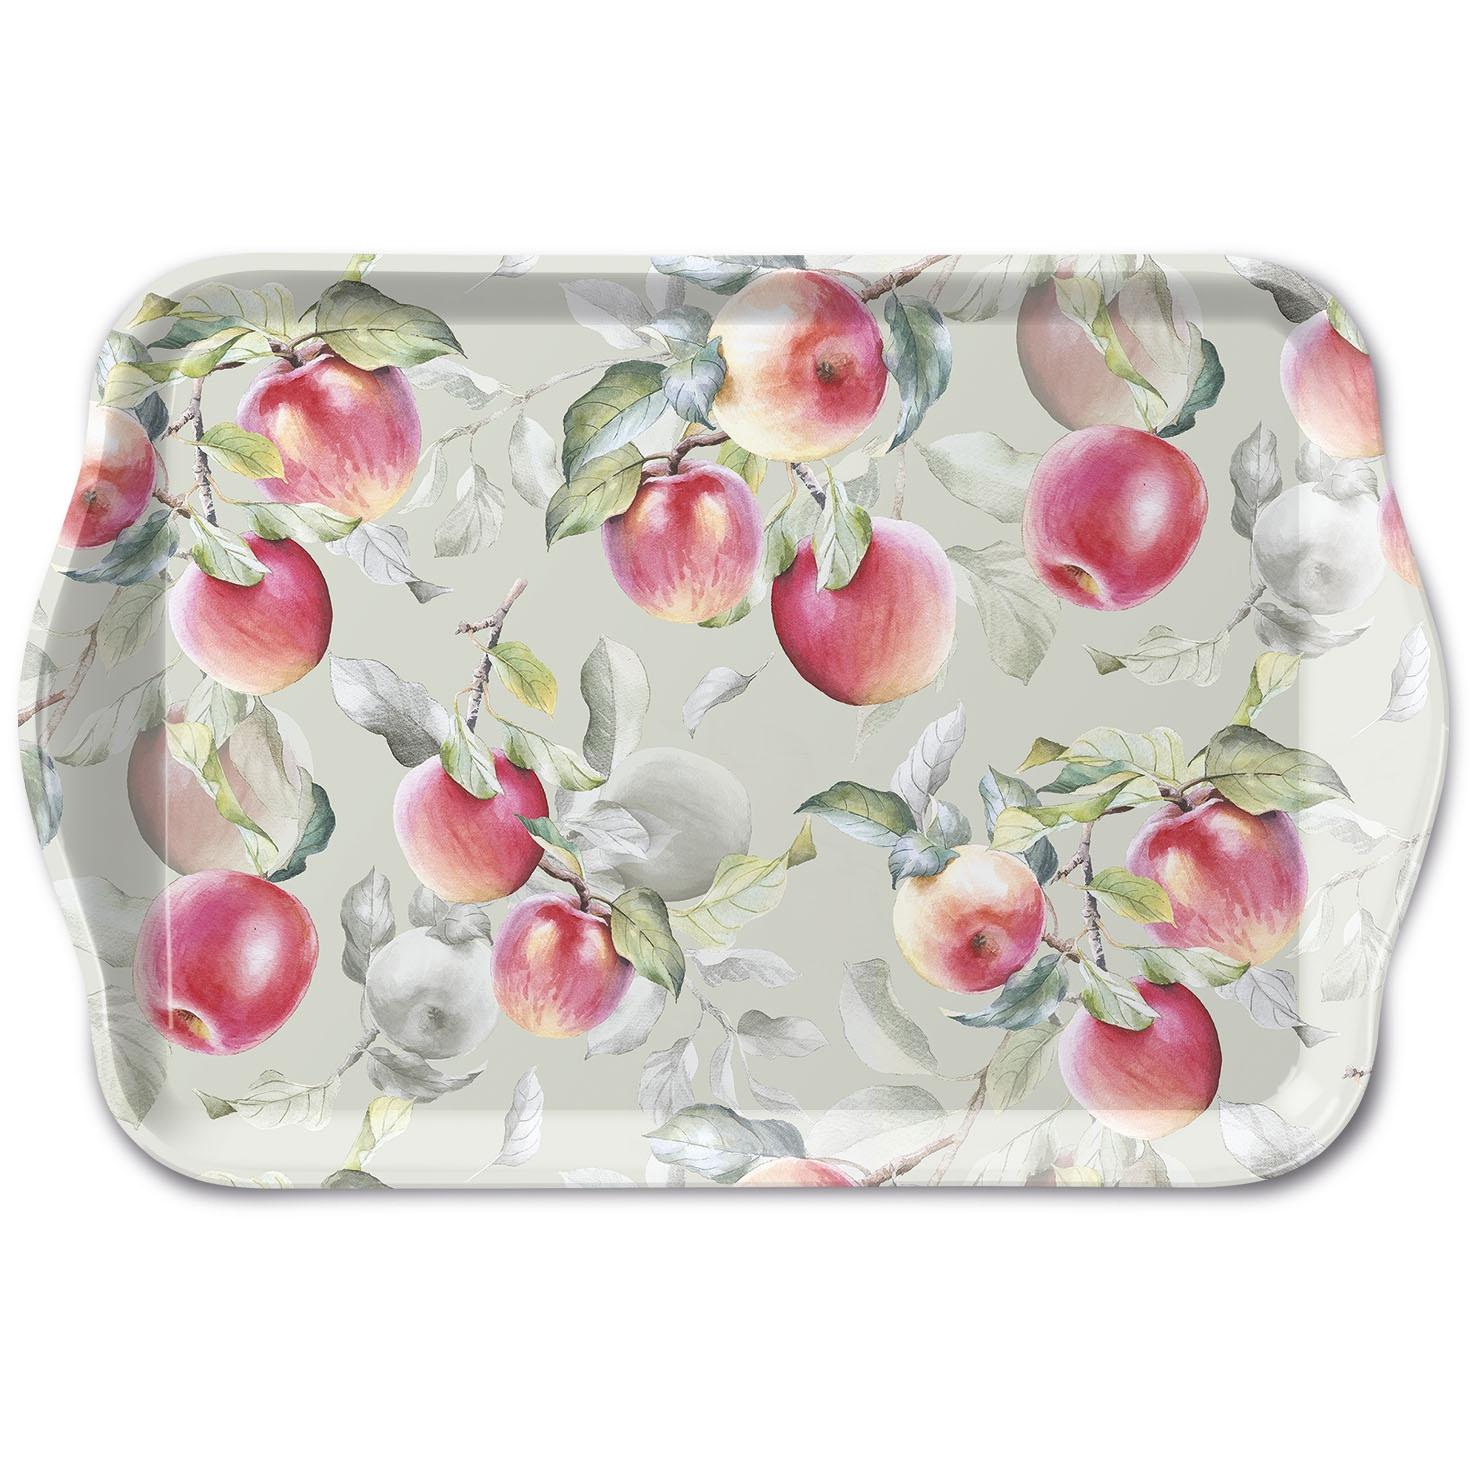 tray - Fresh Apples Green